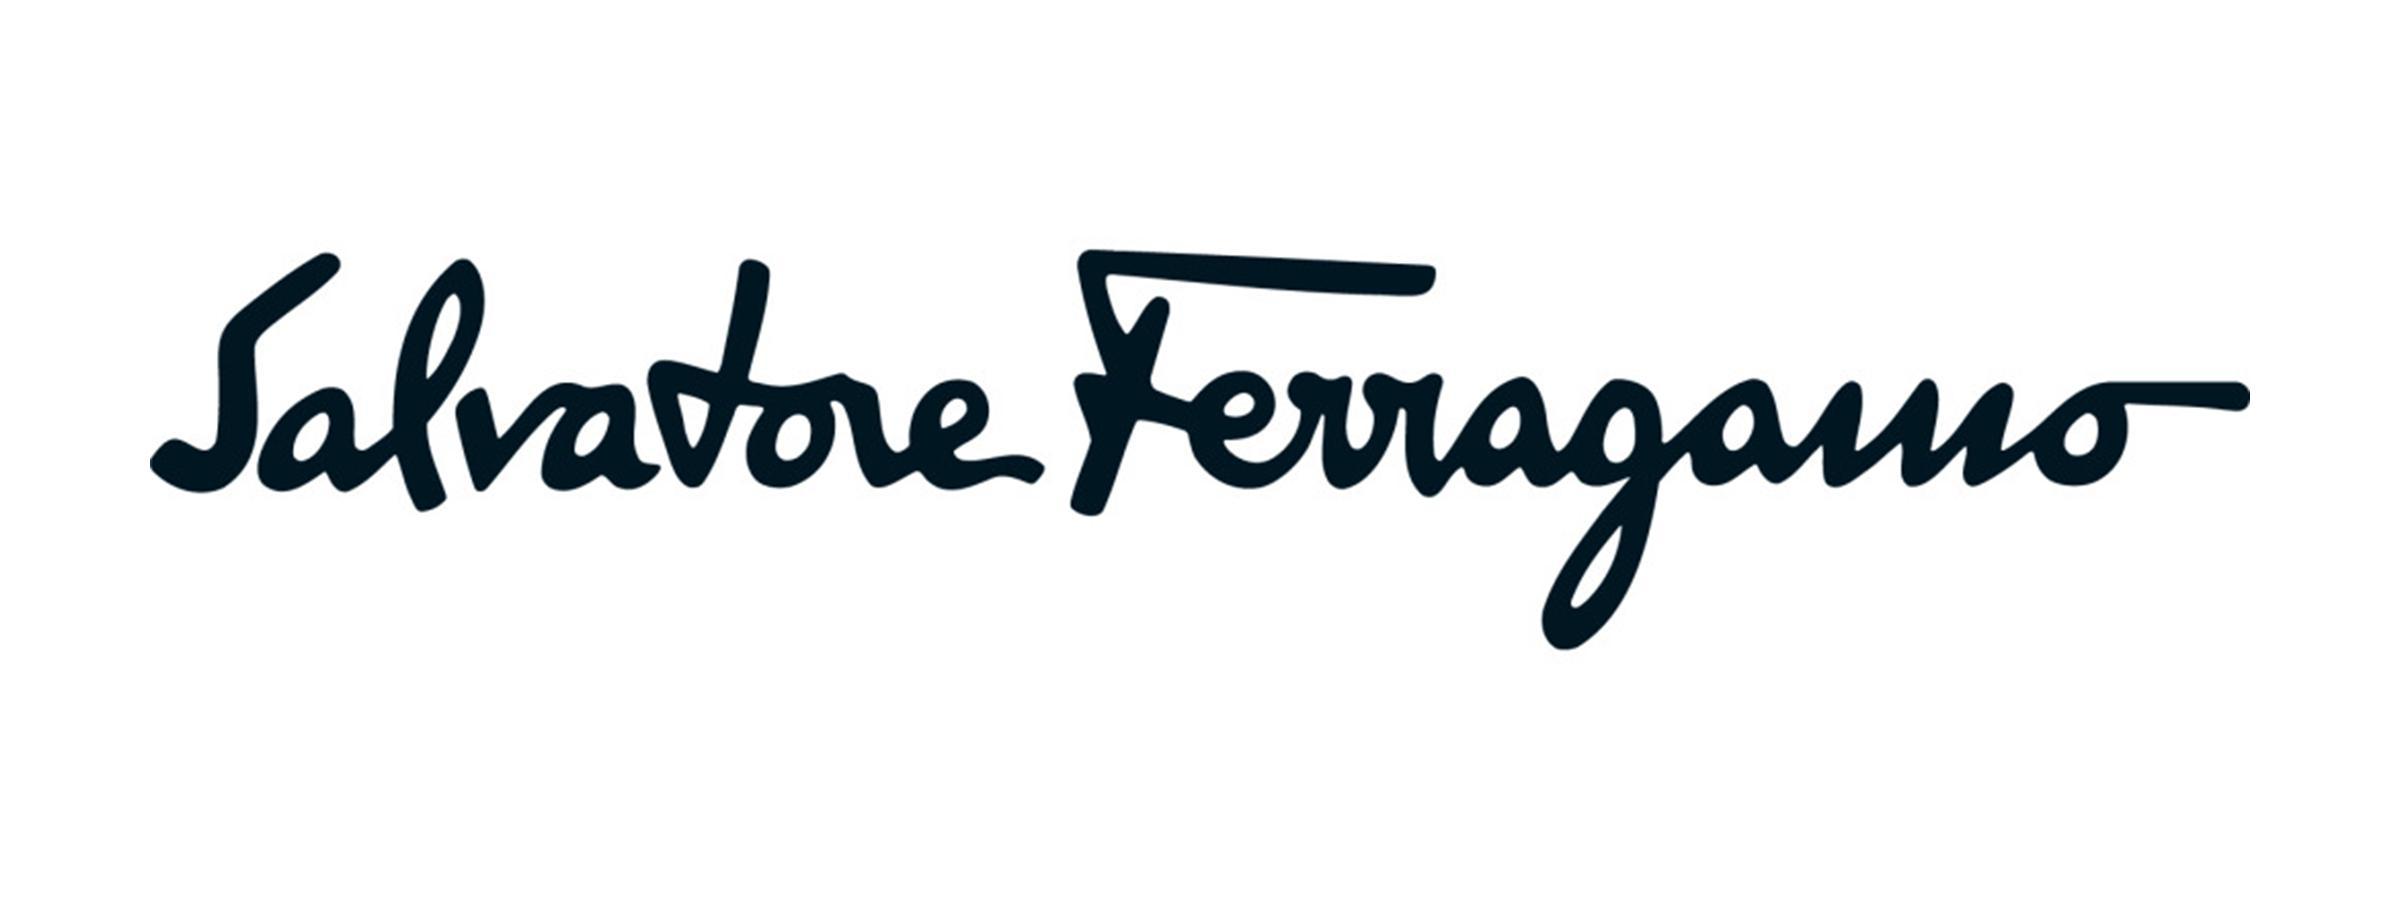 SALVATORE FERRAGAMO — обаяние классики